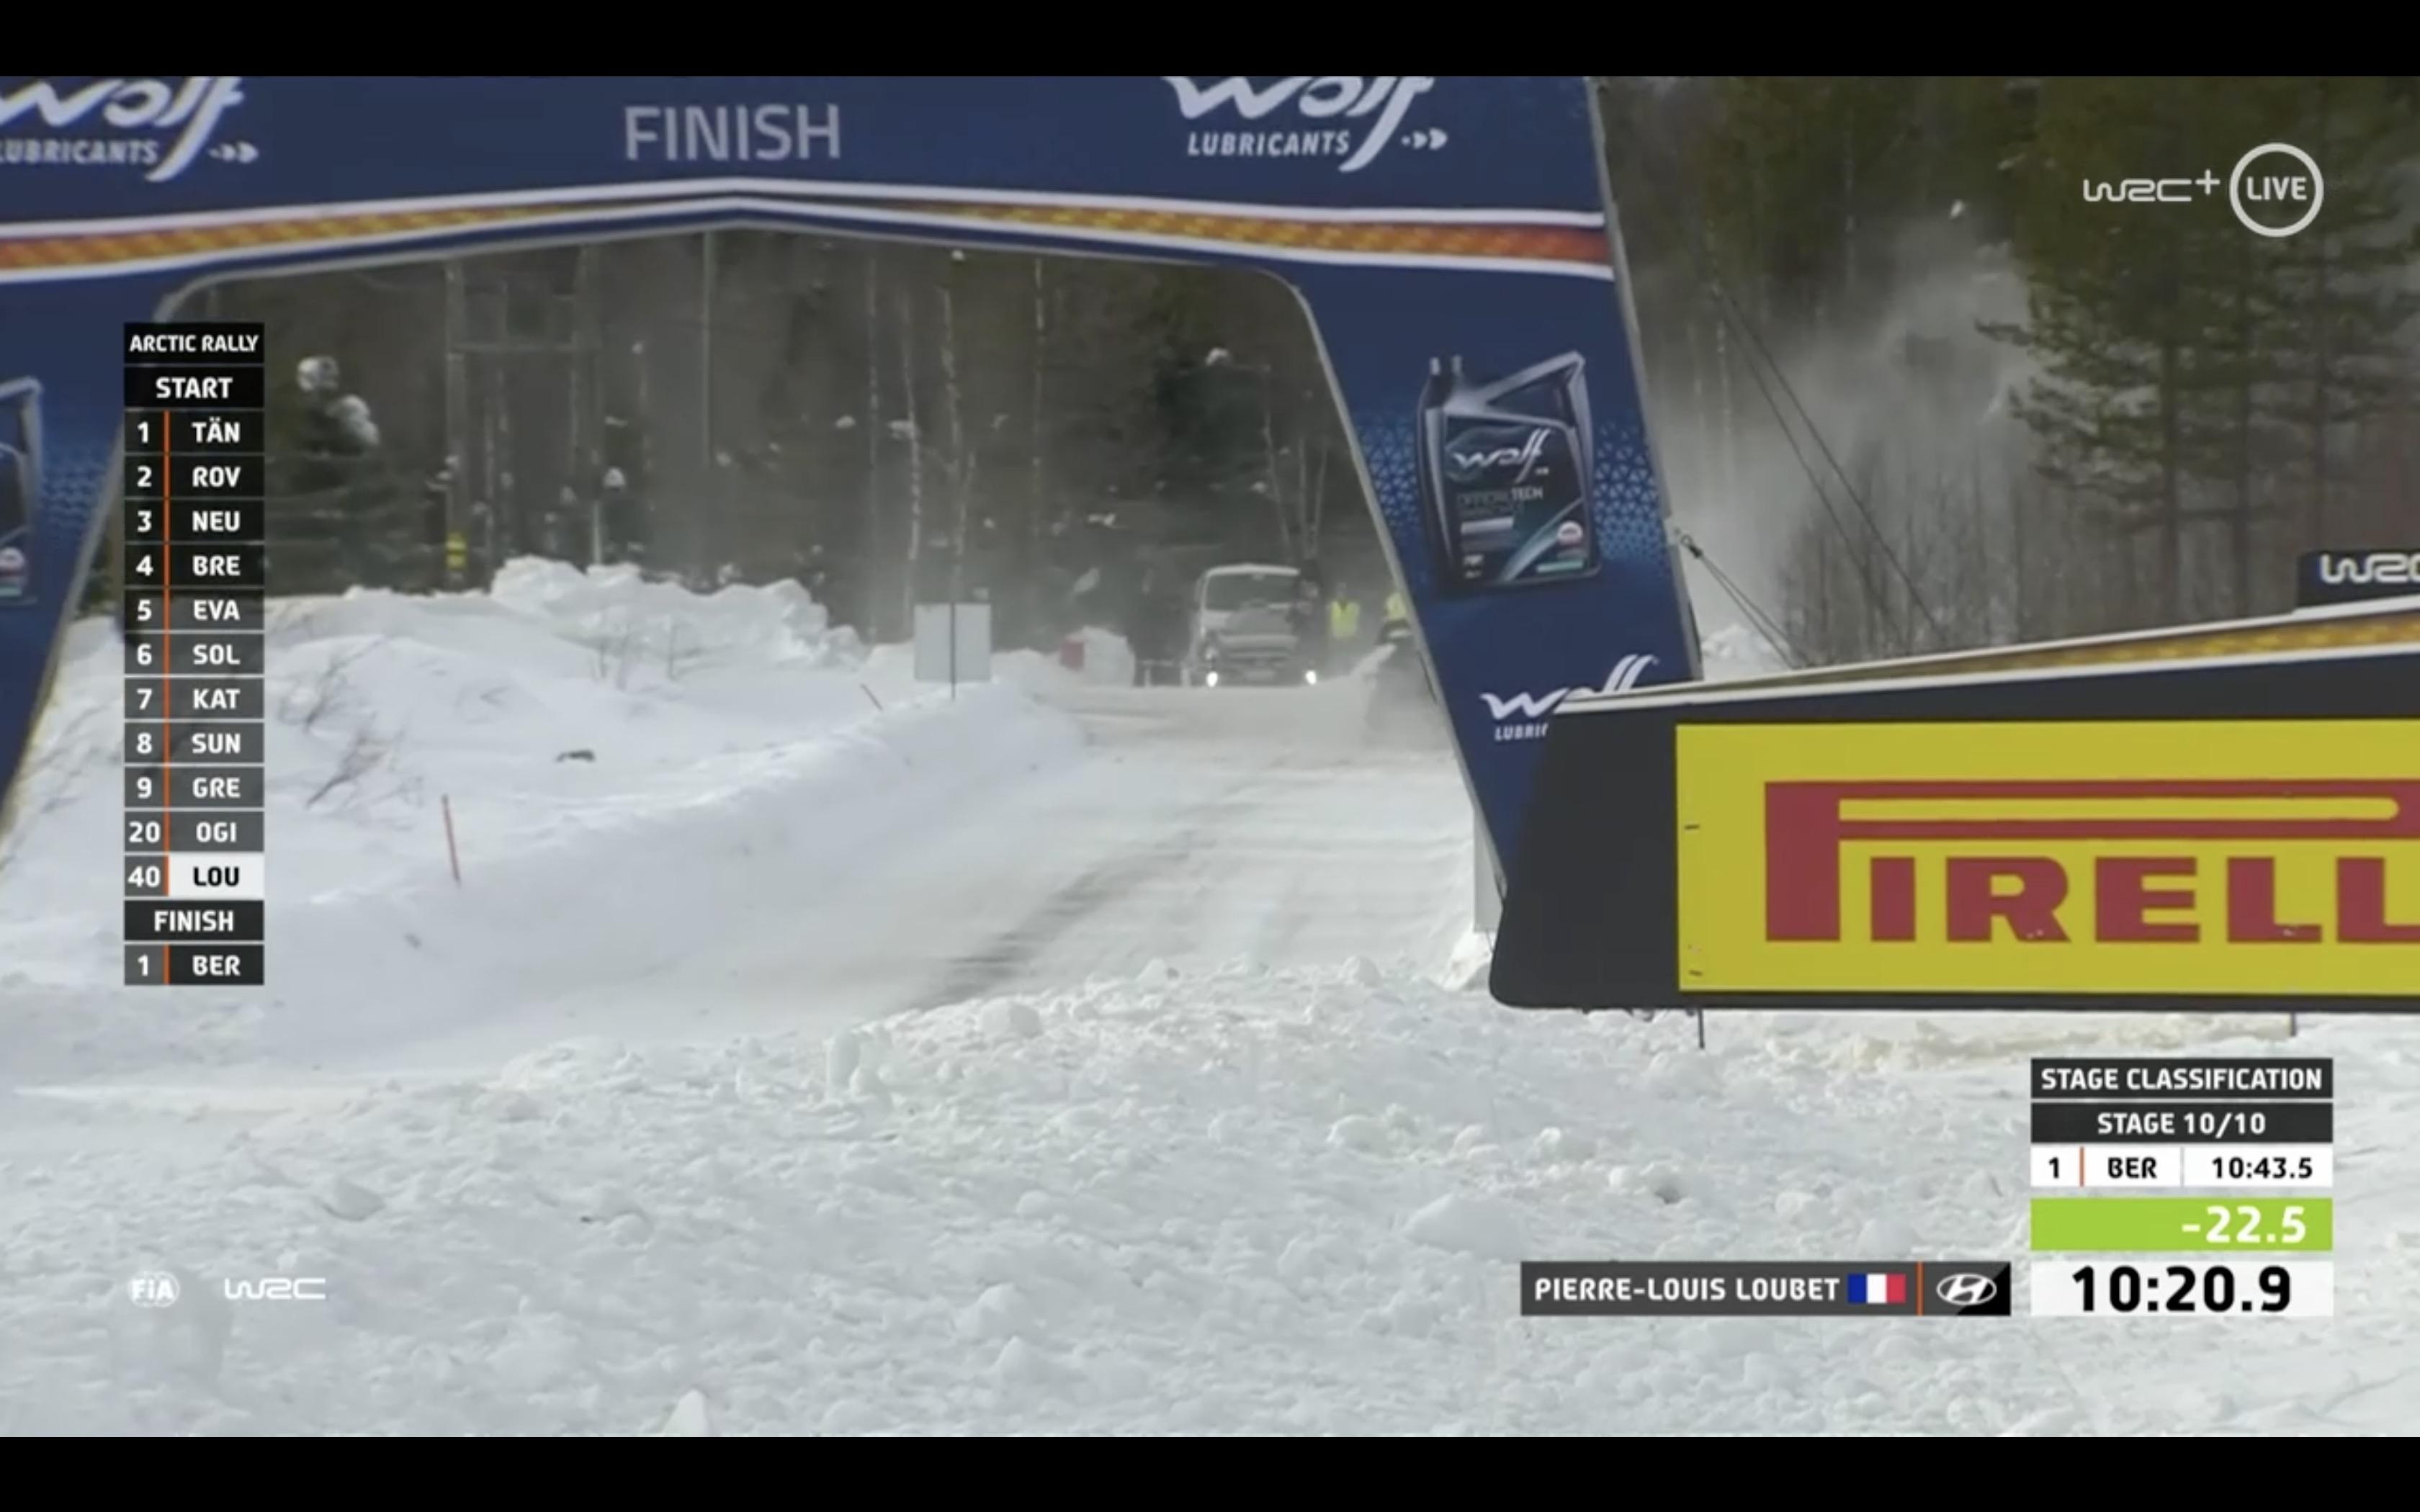 WRC: Arctic Rally Finland - Powered by CapitalBox [26-28 Febrero] - Página 7 EvT3UxHWgAA4PdH?format=jpg&name=4096x4096